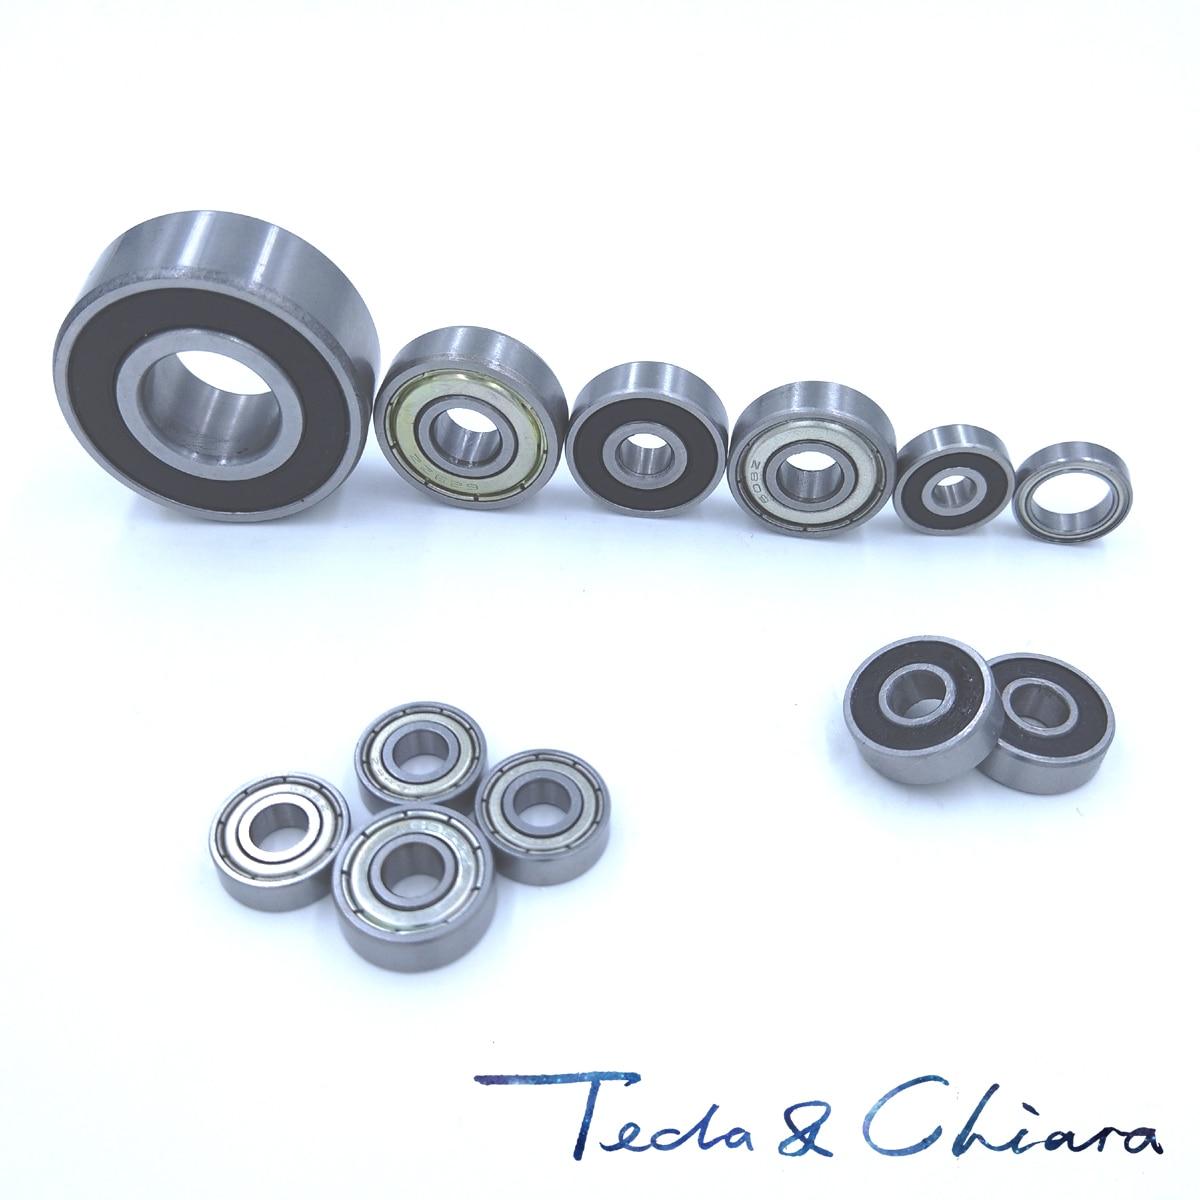 6201 6201ZZ 6201RS 6201-2Z 6201Z 6201-2RS ZZ RS RZ 2RZ Deep Groove Ball Bearings 12 X 32 X 10mm